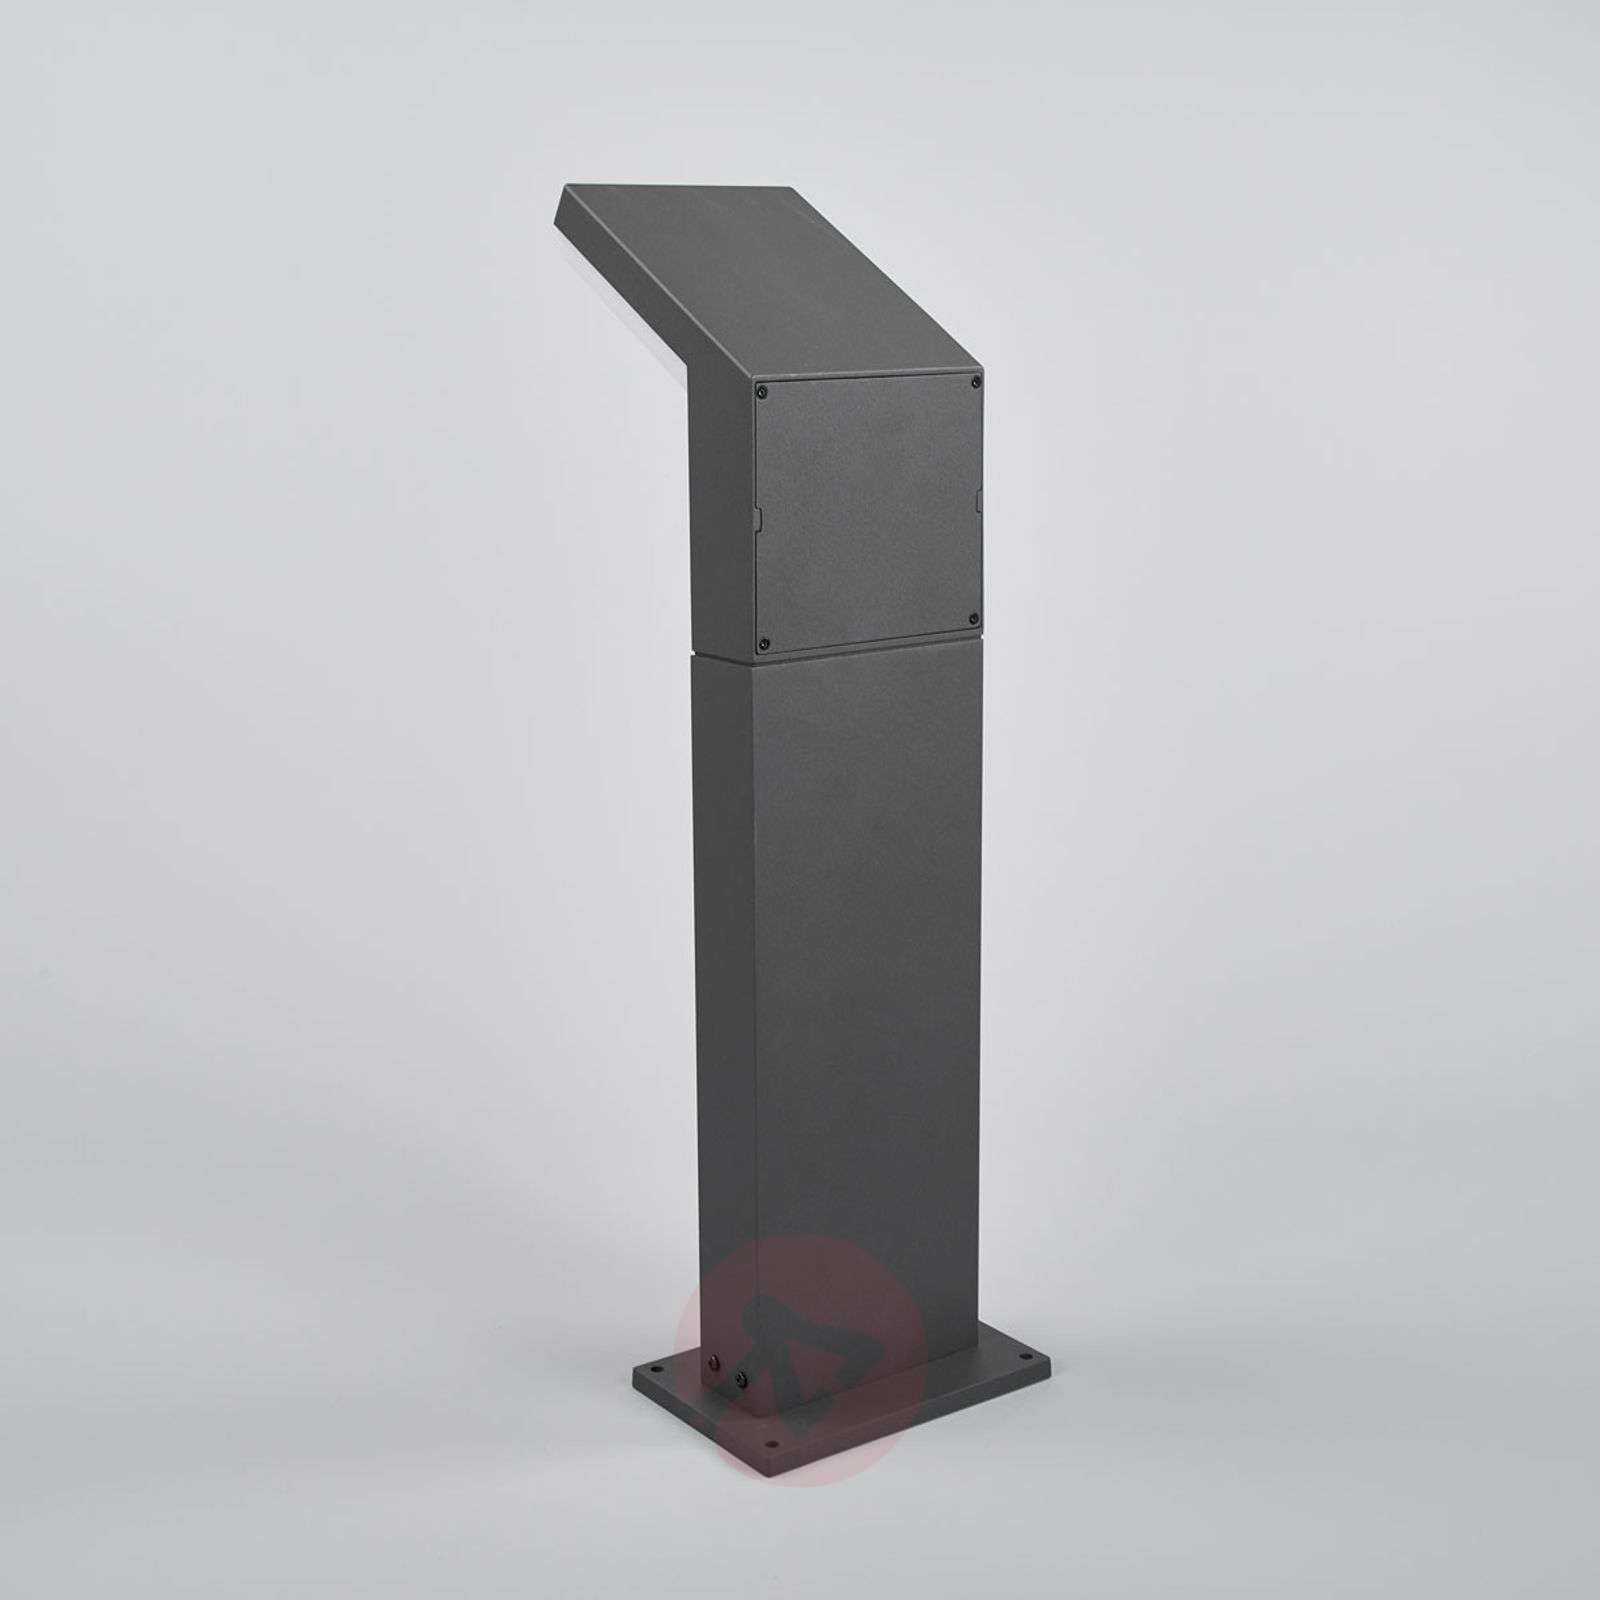 LED-pylväsvalaisin Yolena sensorilla, 60 cm-9619121-02